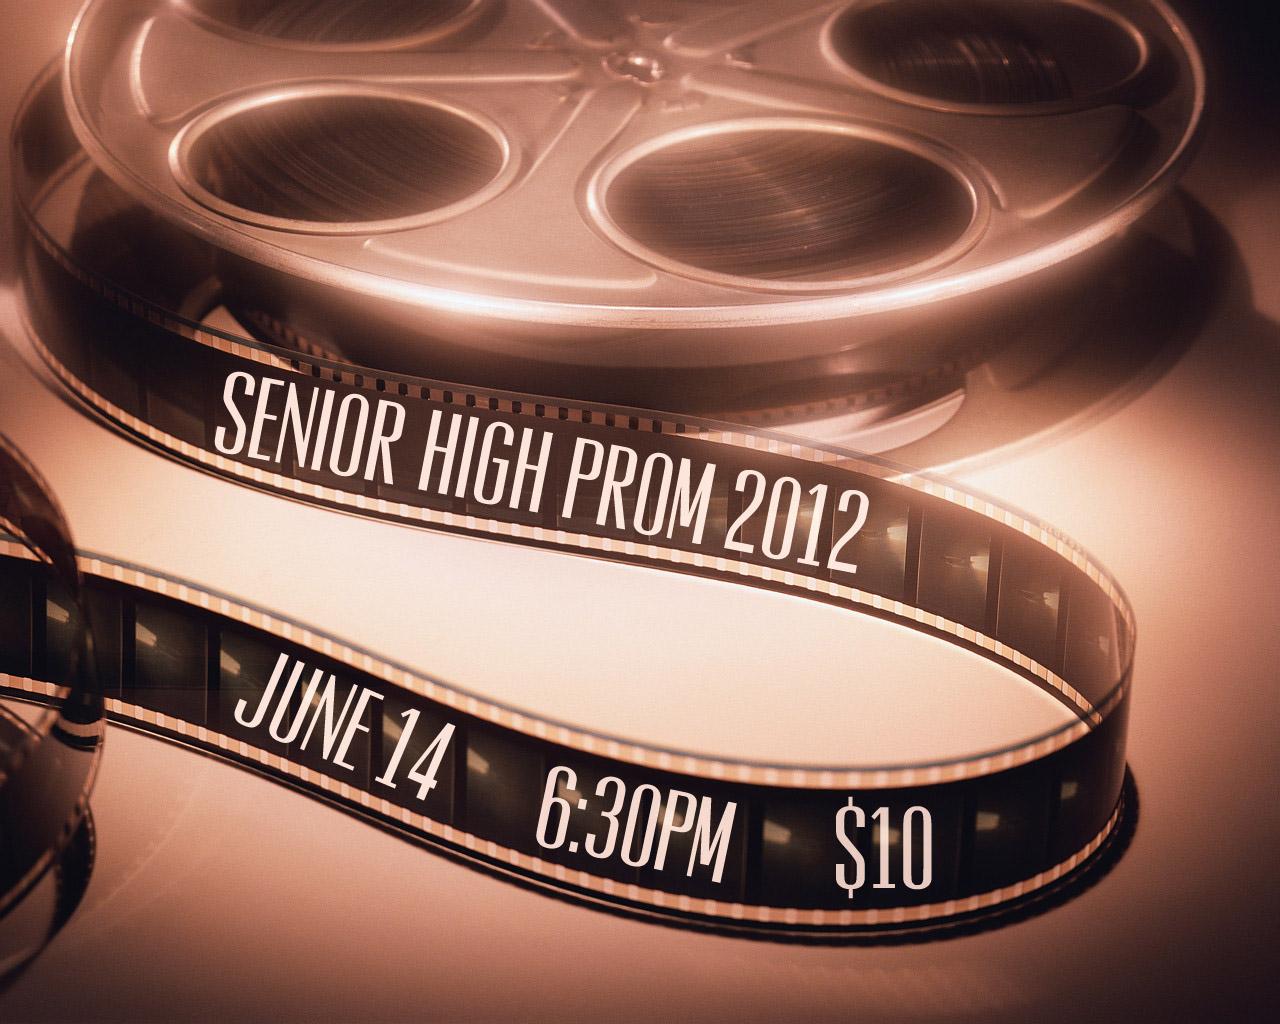 Senior High Prom 2012